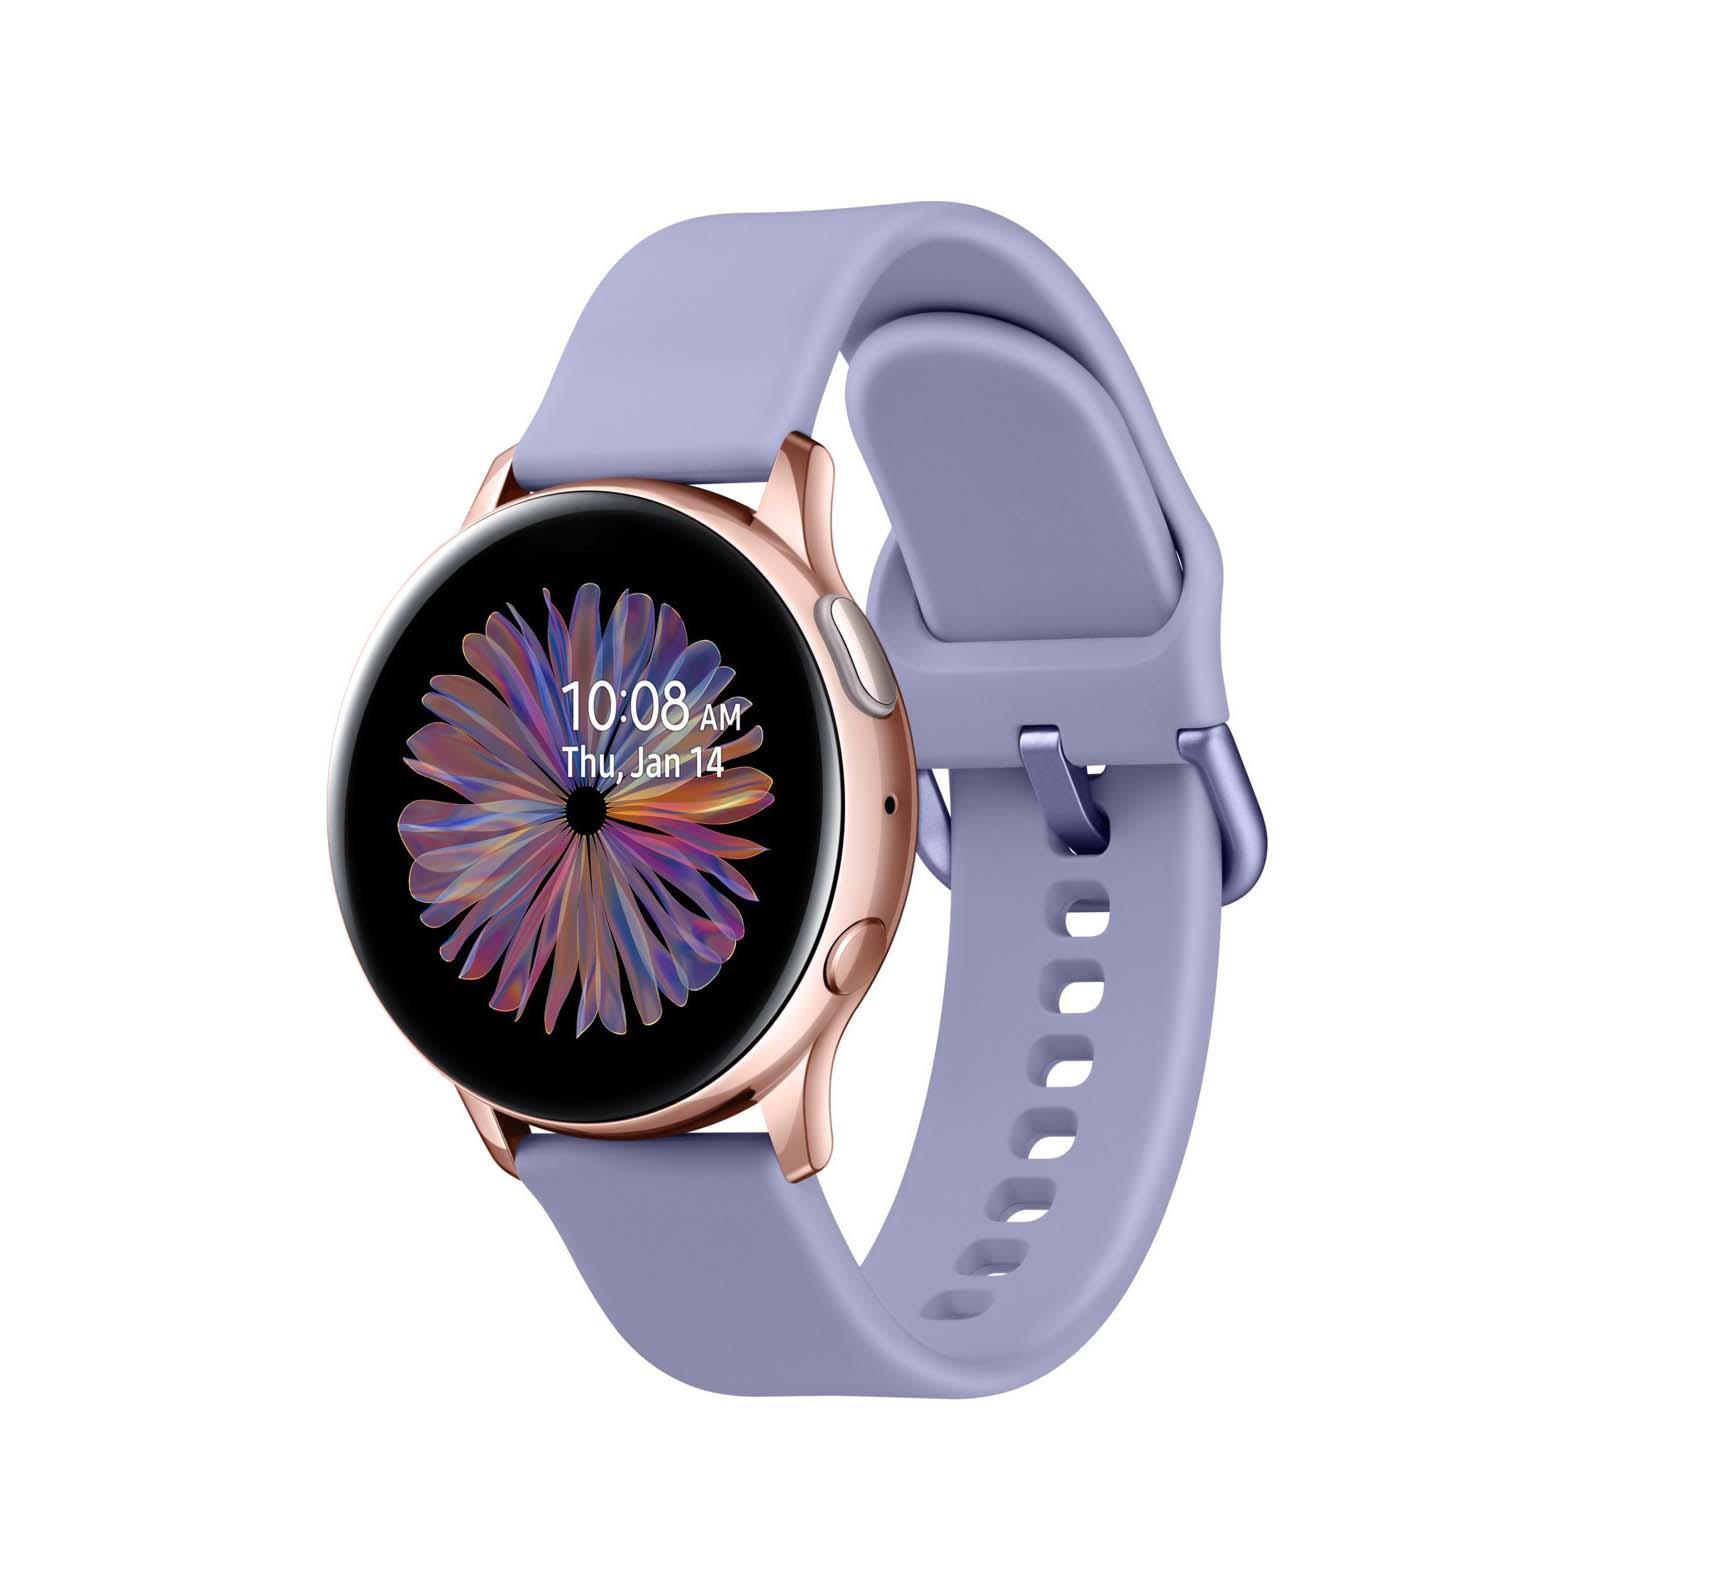 Samsung Galaxy Watch Active 2 R830 Aluminium 40mm Rose Gold Violet Edition (SM-R830NADADBT) Πληρωμή έως 24 δόσεις*